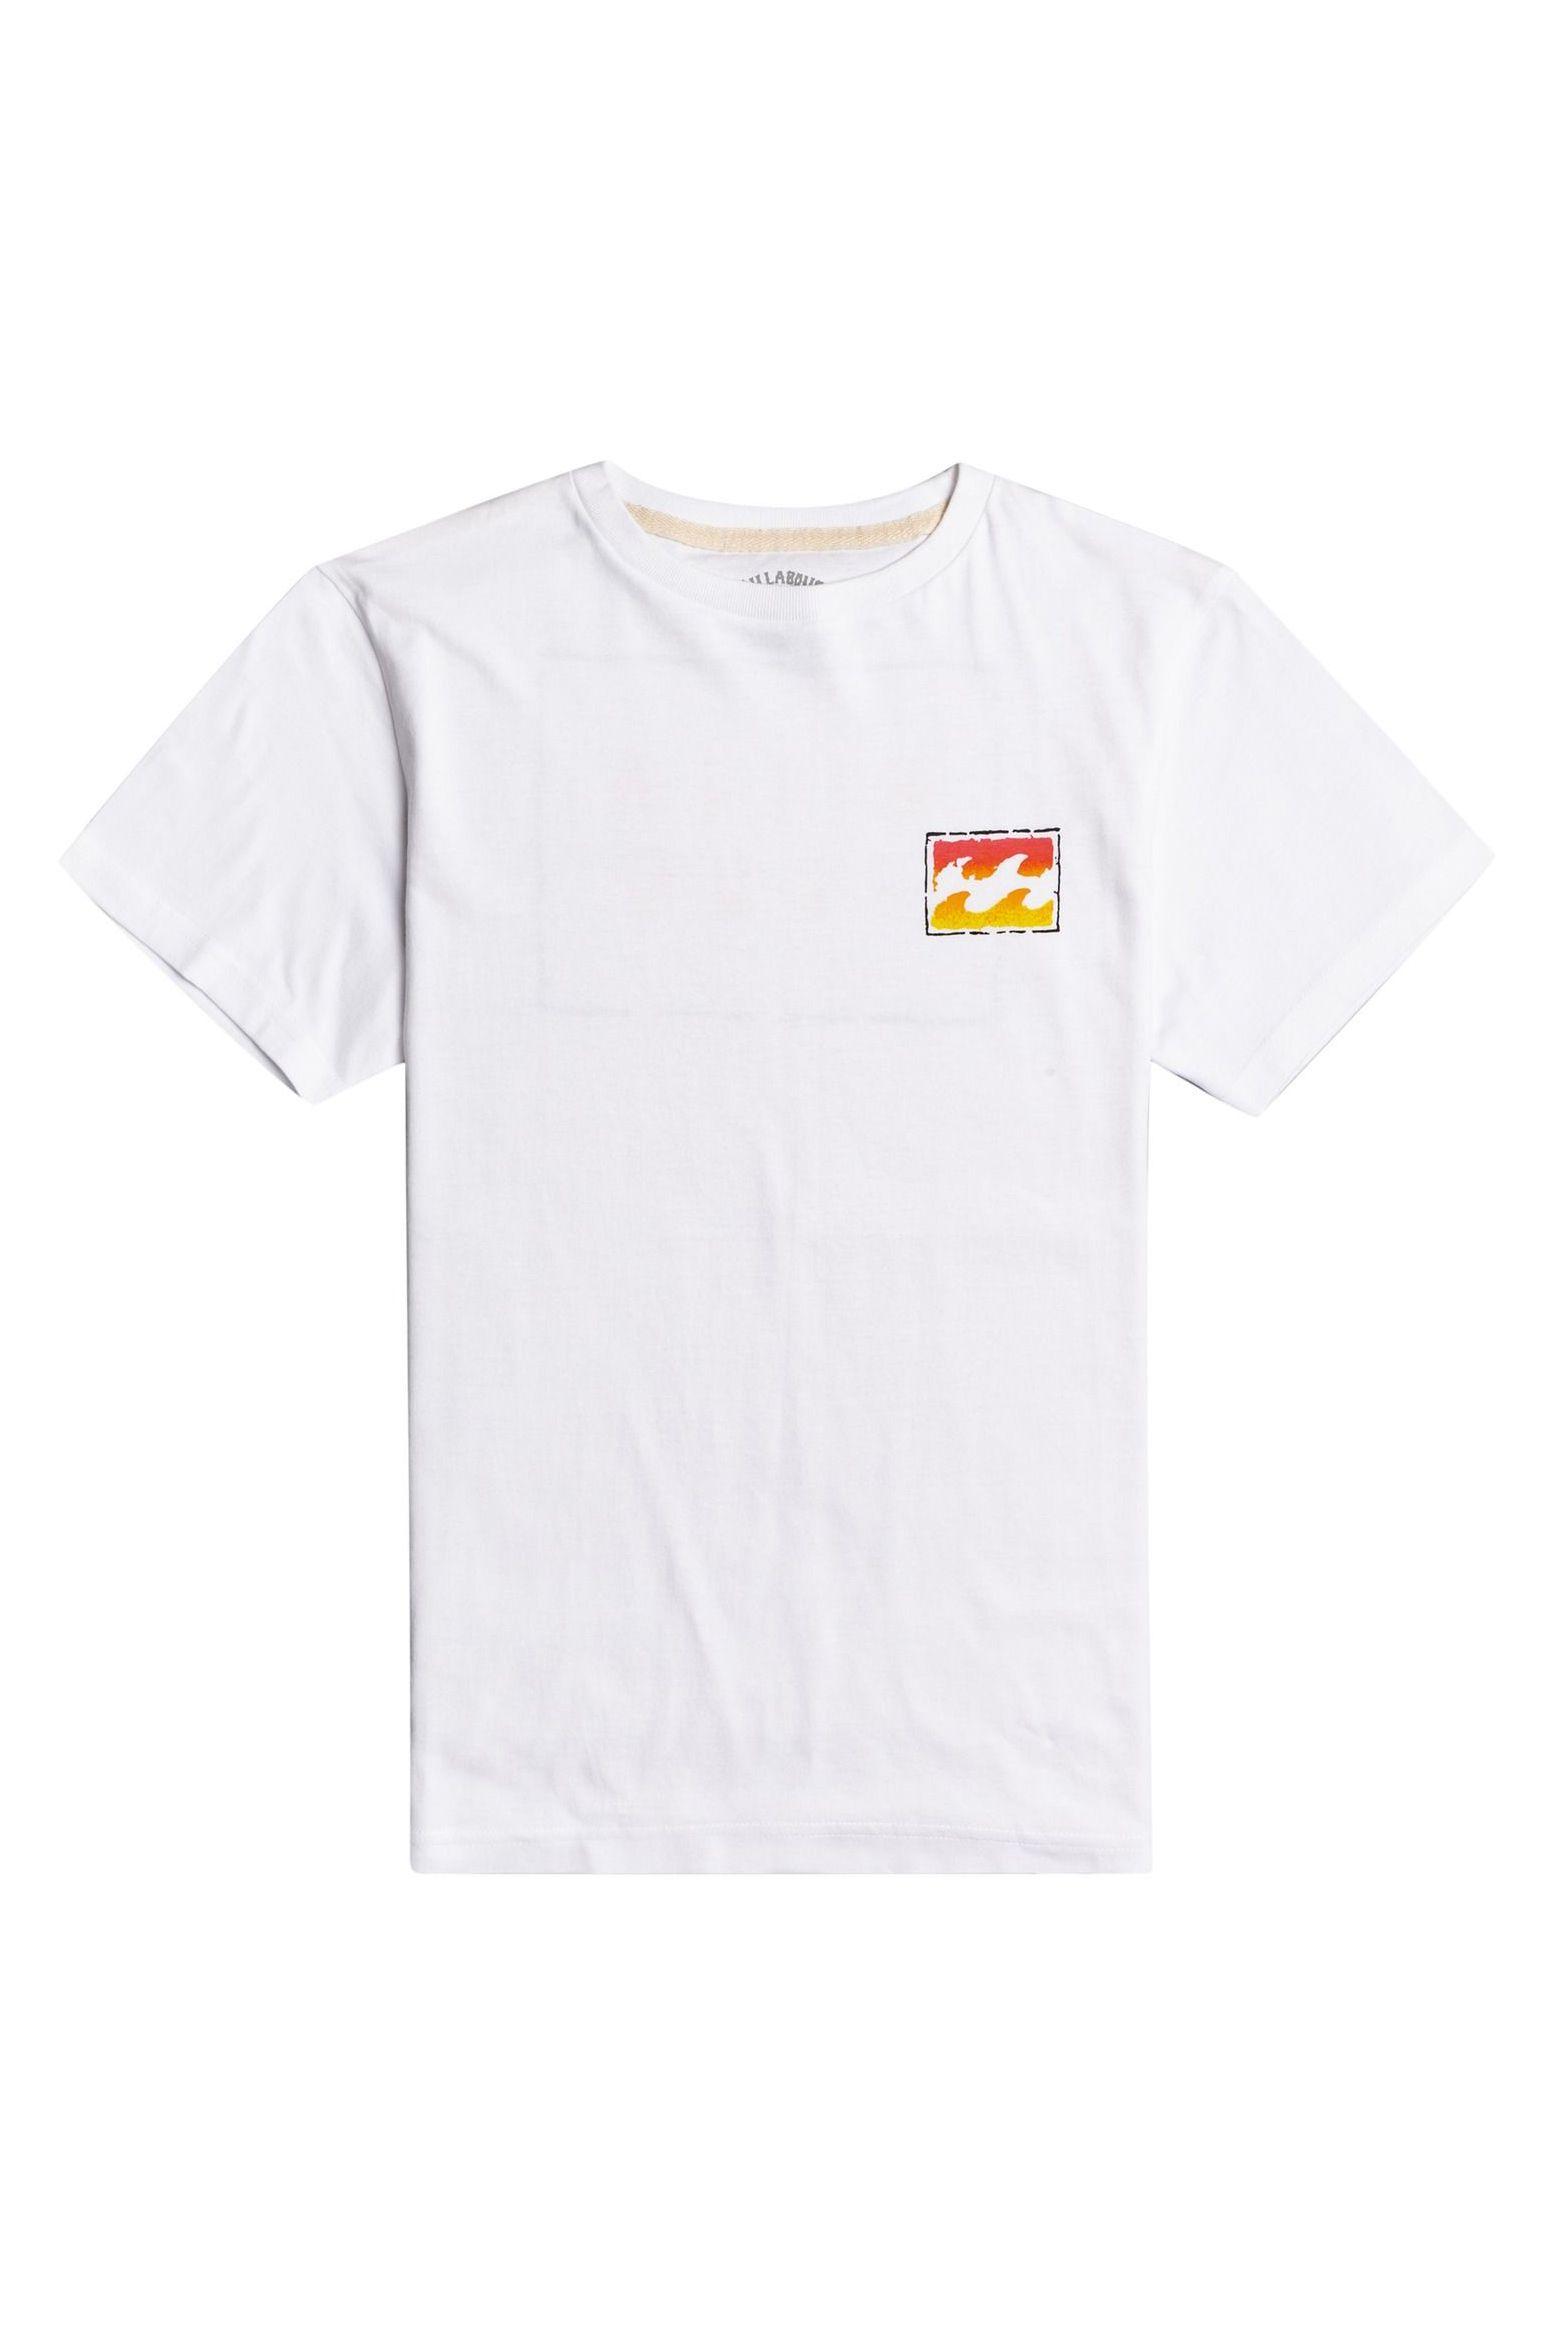 T-Shirt Billabong UNITY PAINT SS BOY SPORTING GOOD PROGR. White